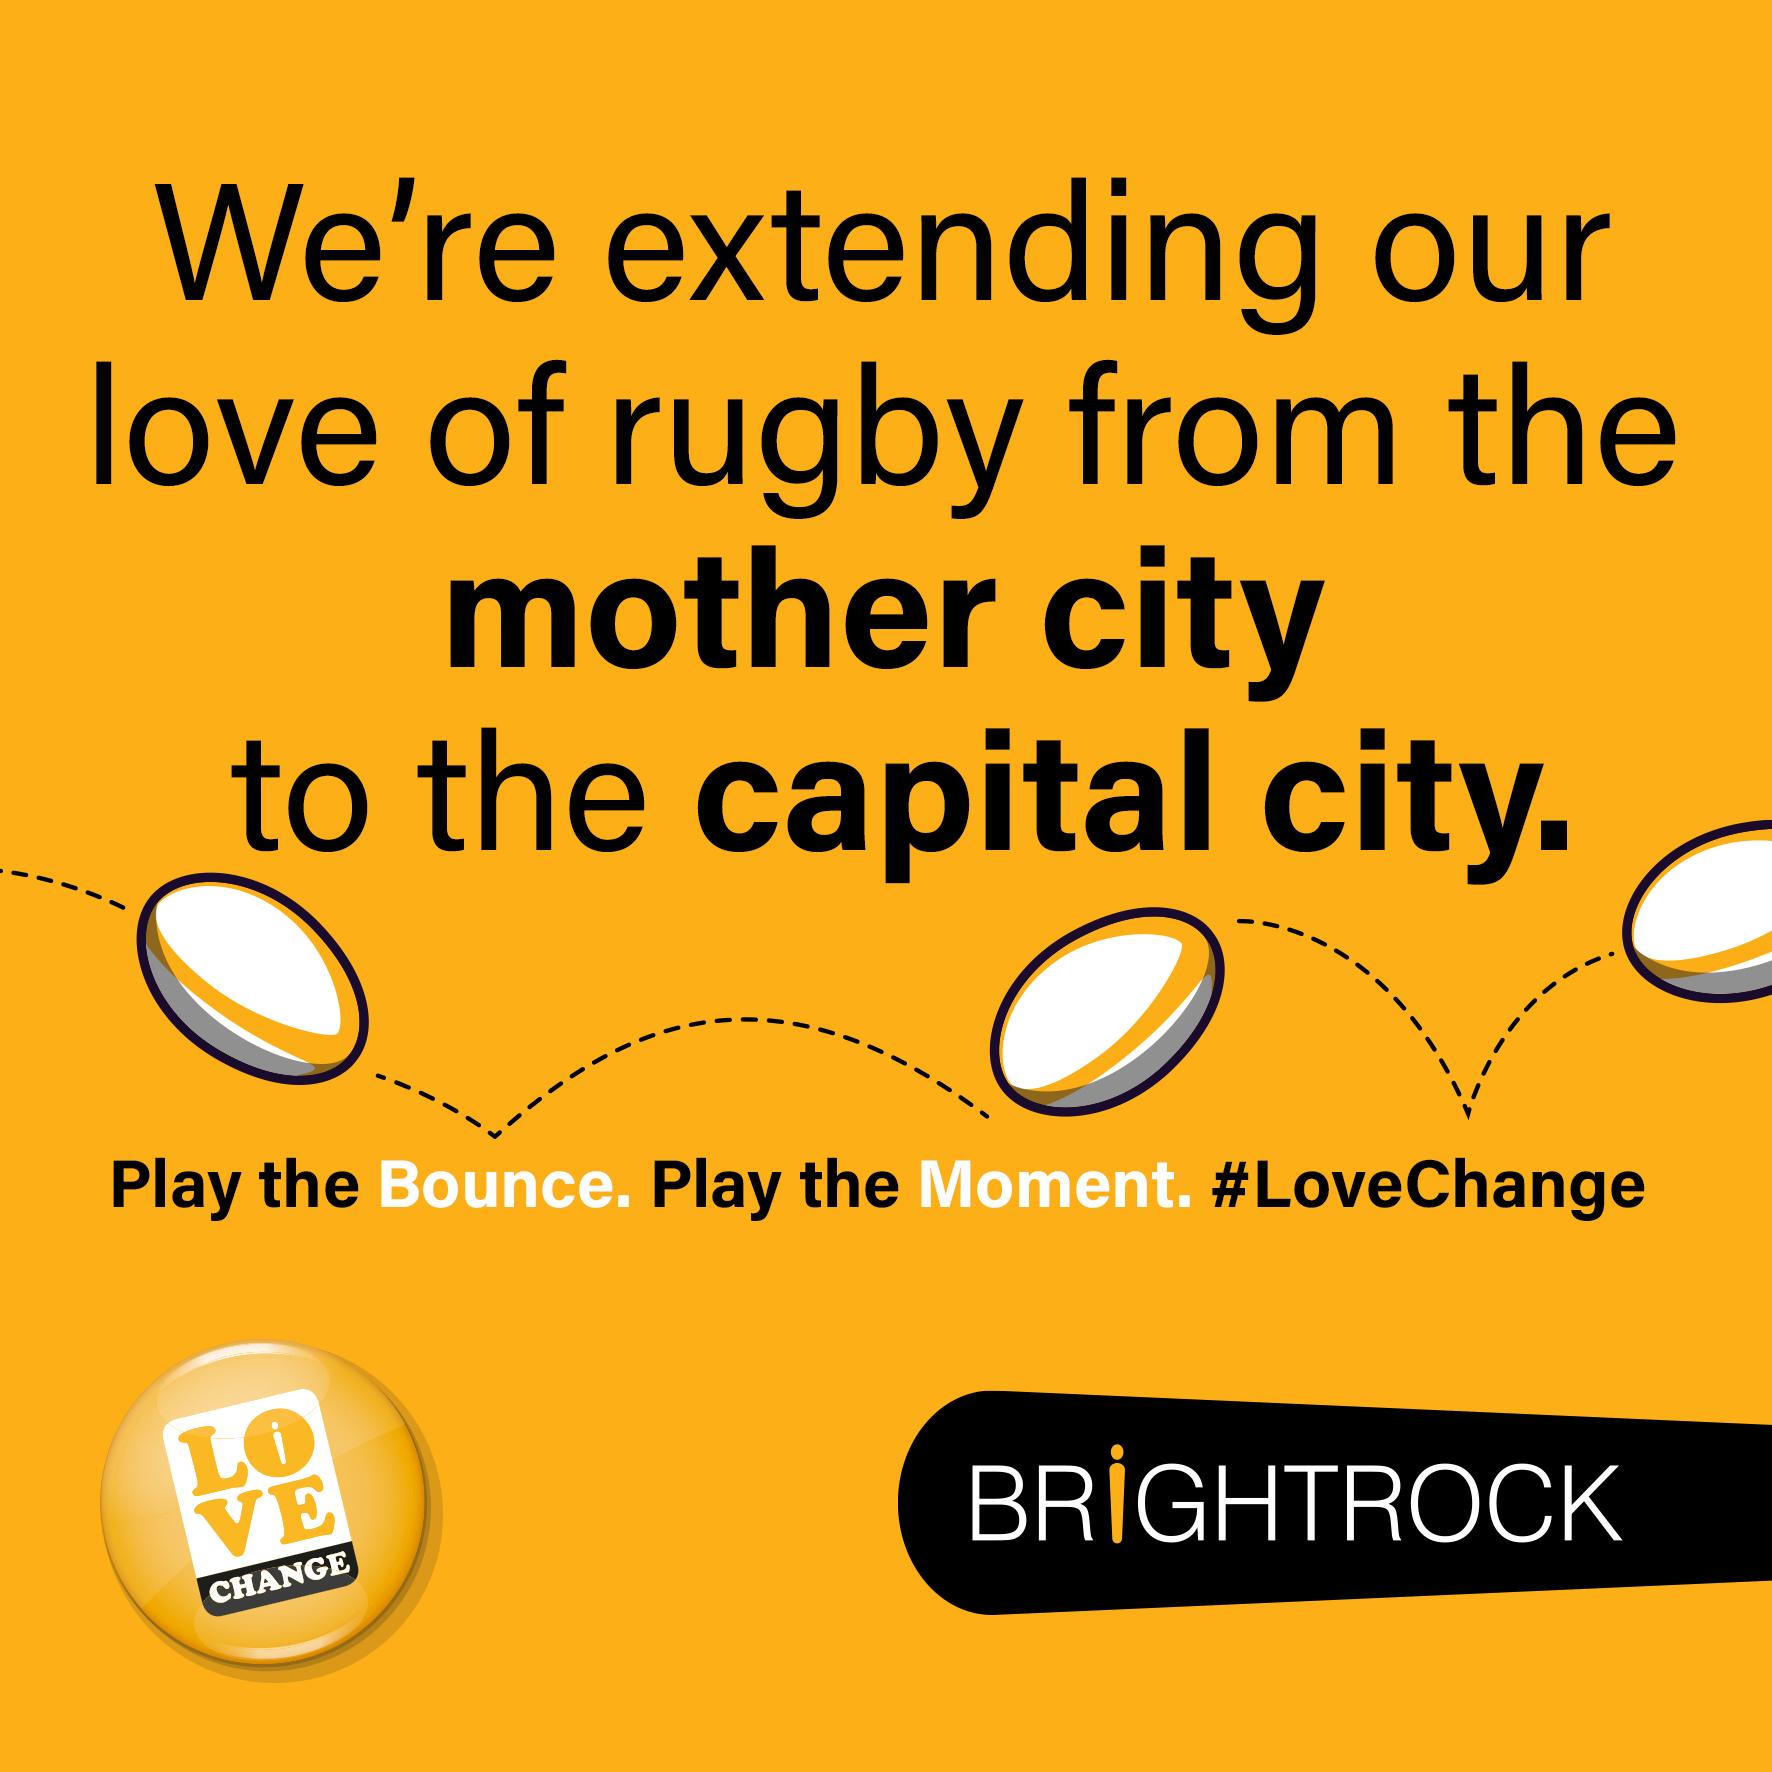 BrightRock's got the Vodacom Bulls' BACK